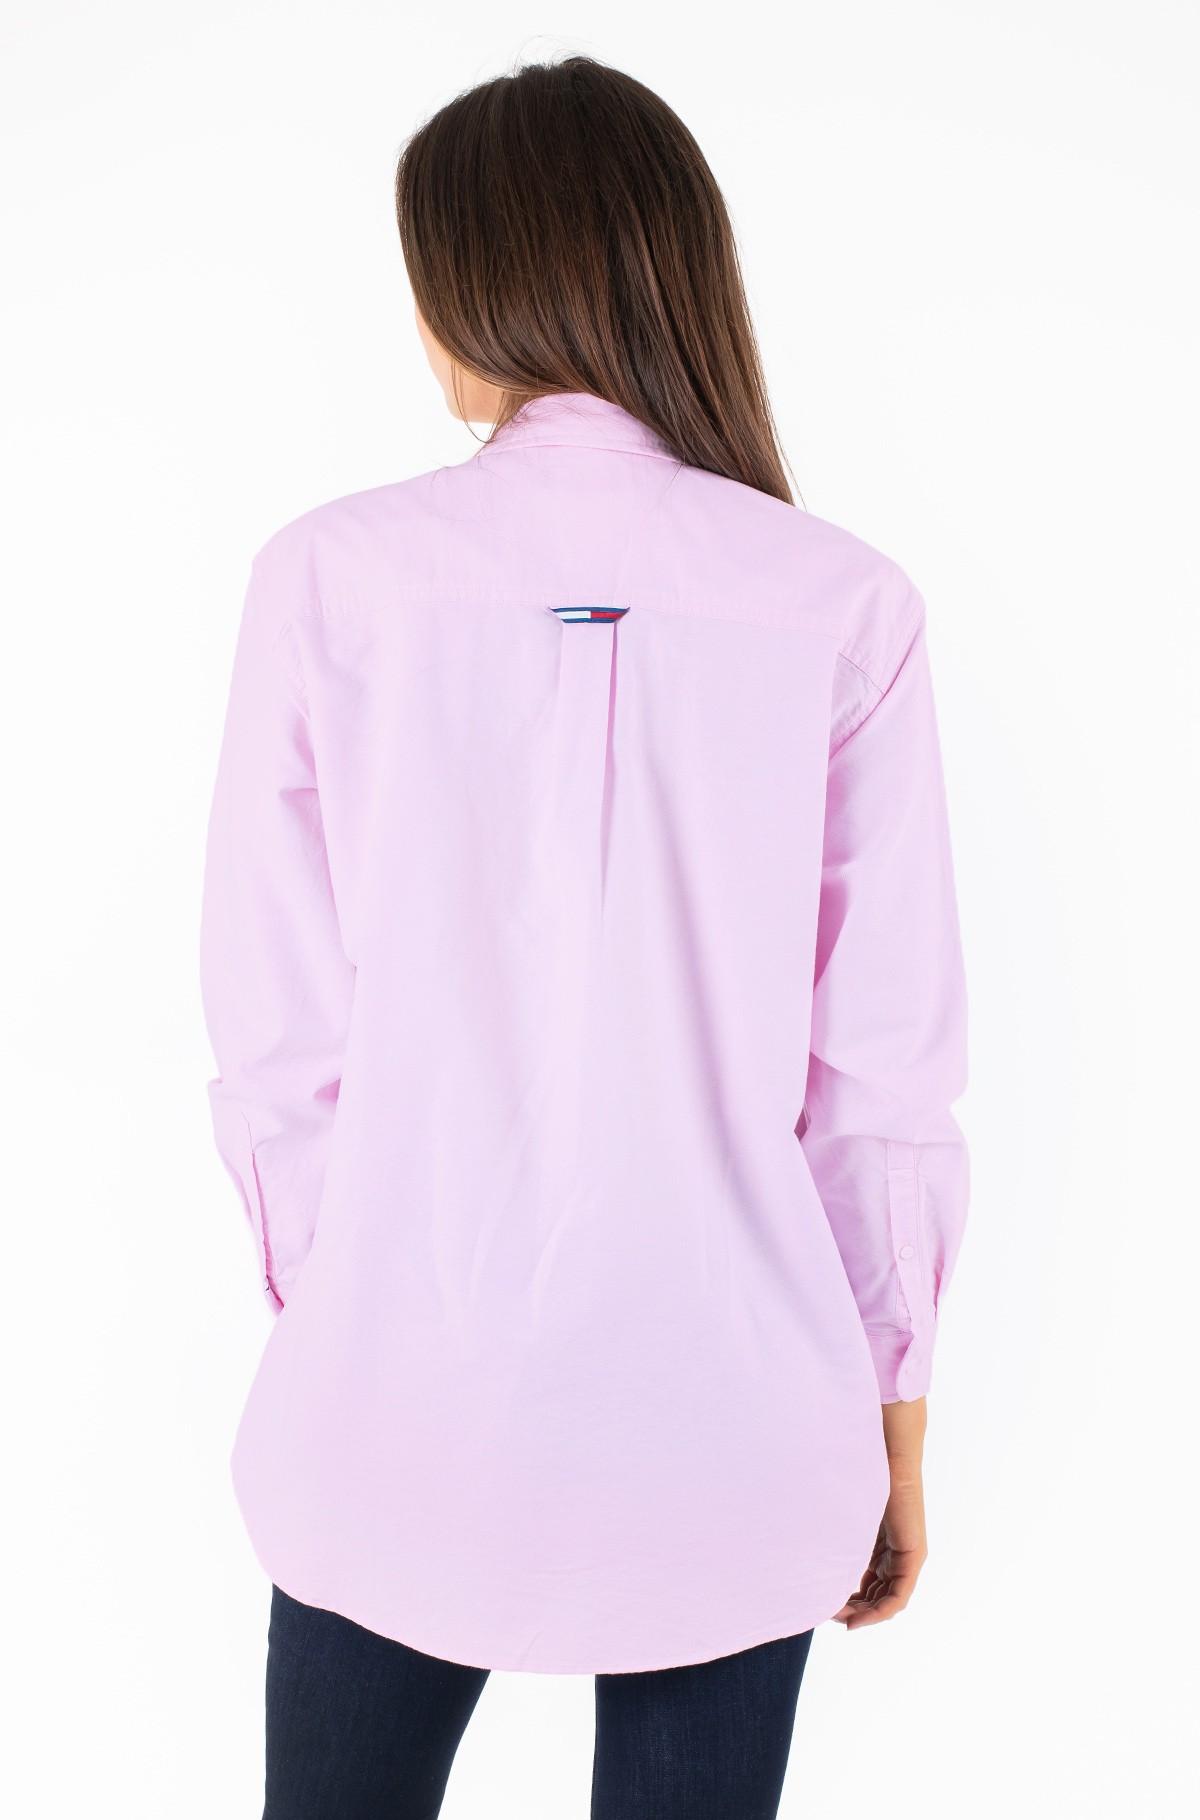 Marškiniai TJW TOMMY CLASSICS SHIRT-full-2